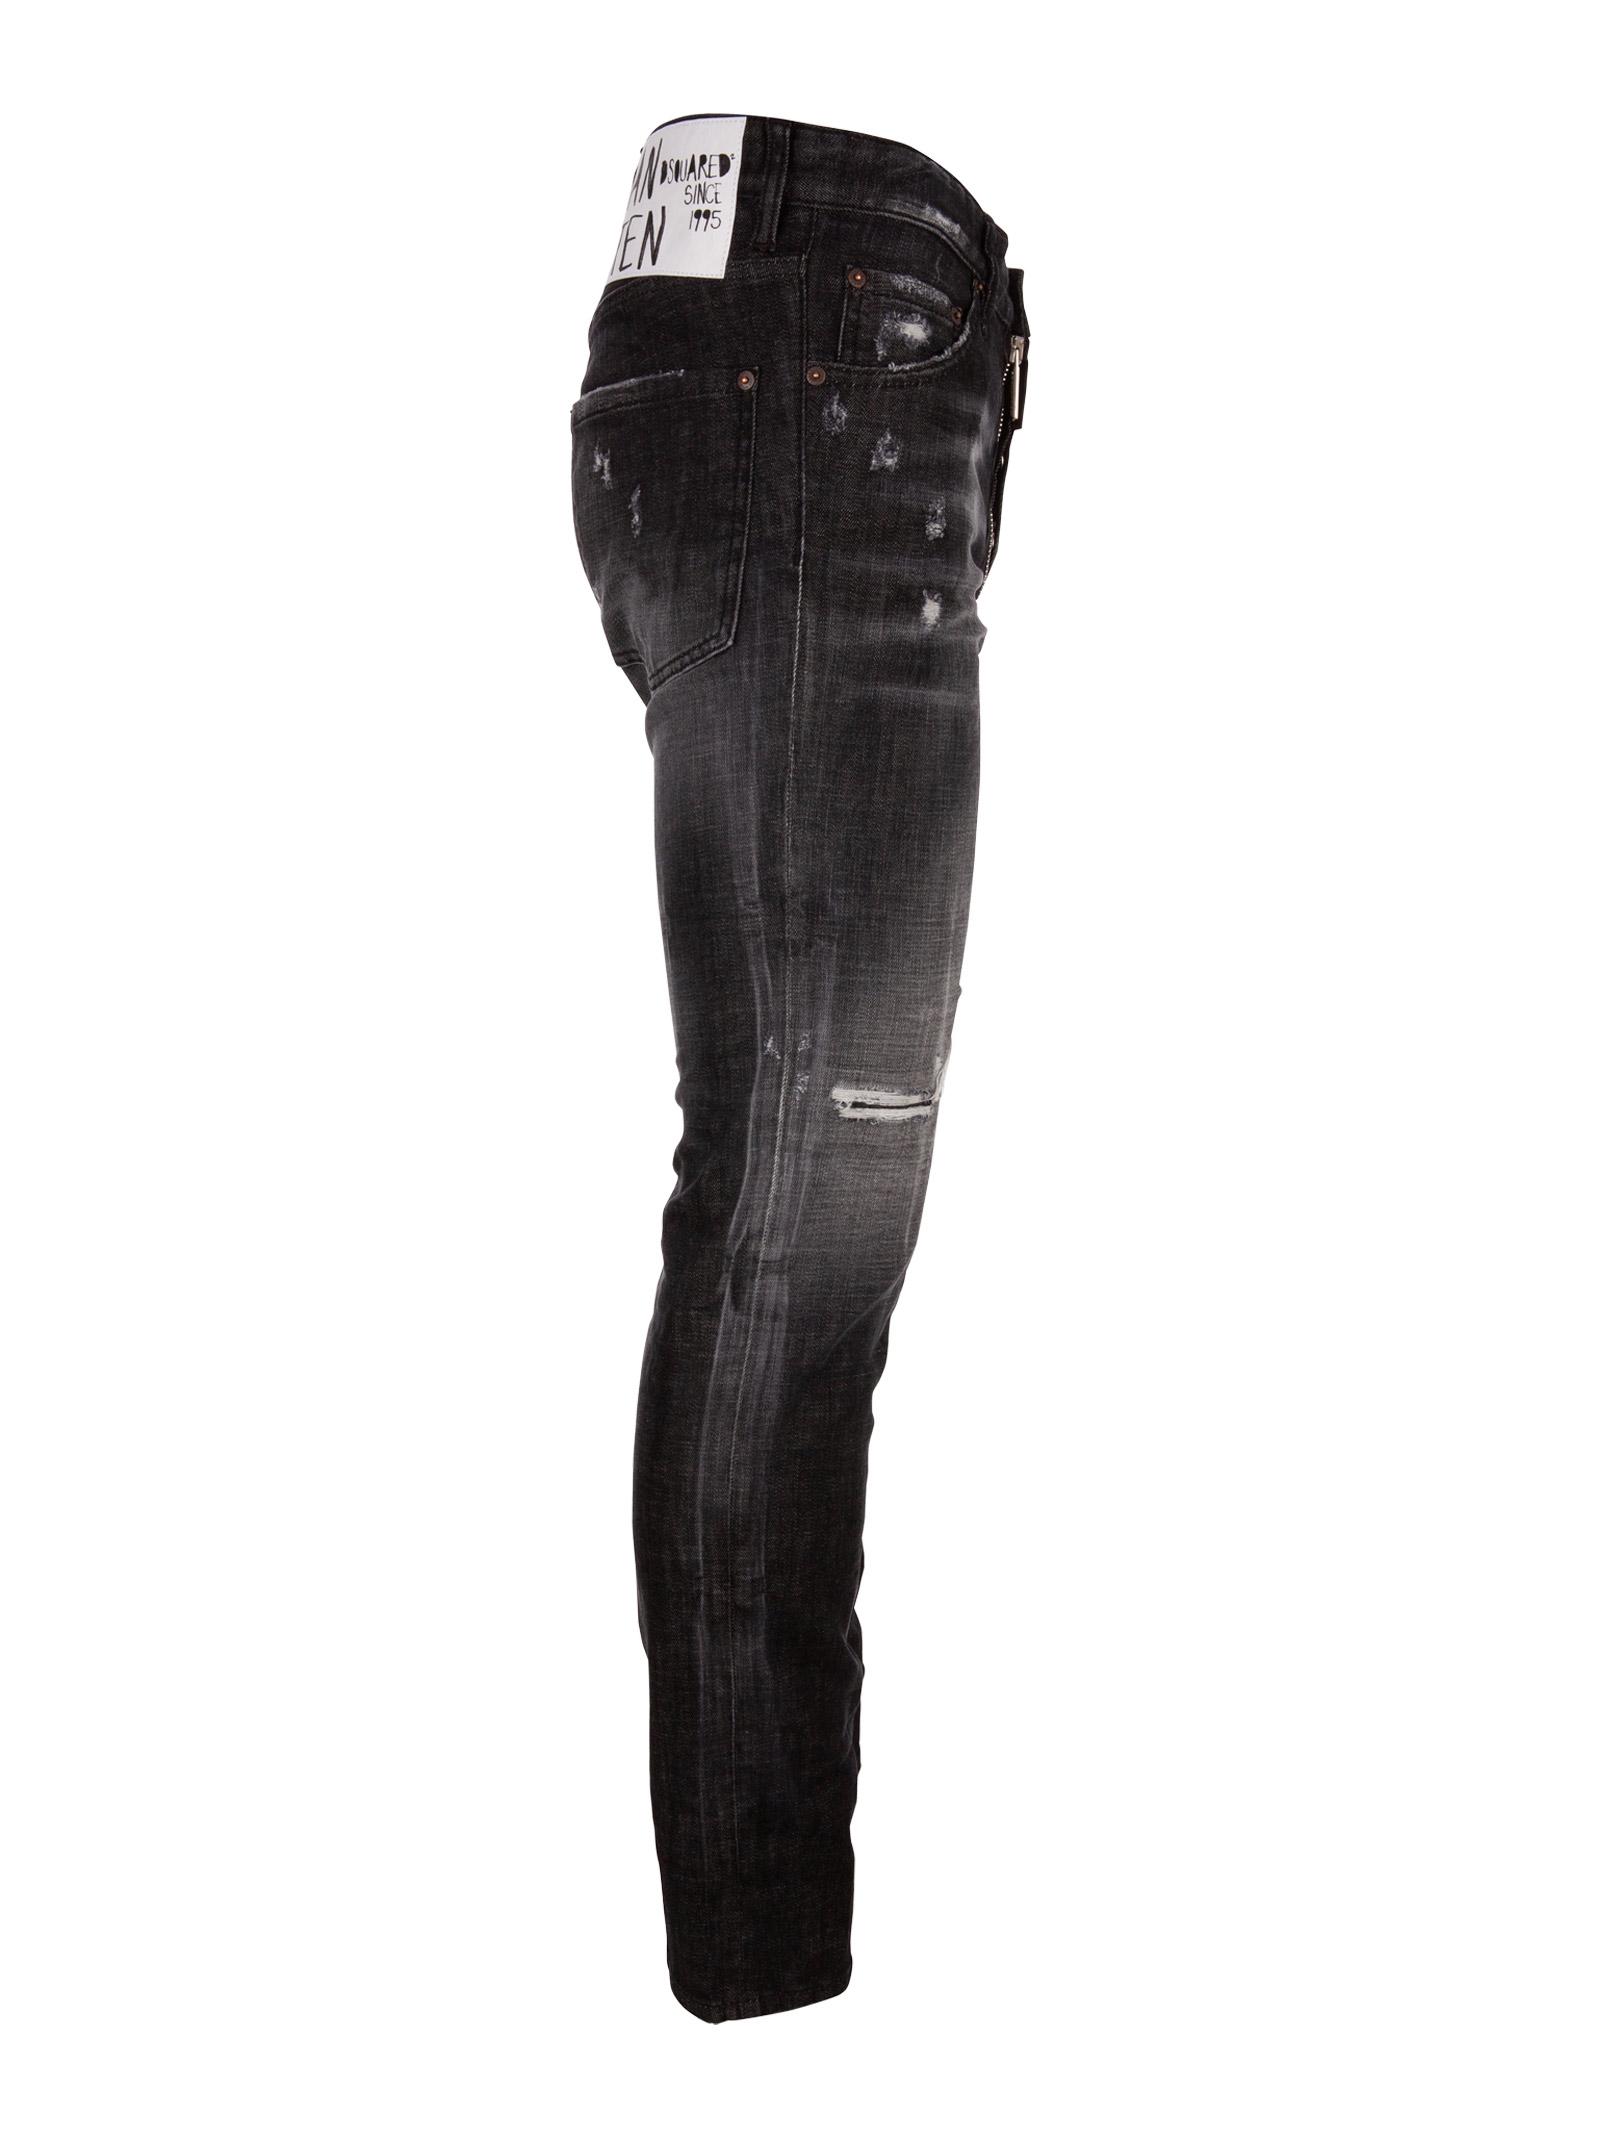 4a8b8362ee3a5 Dsquared2 jeans - Dsquared2 - Michele Franzese Moda